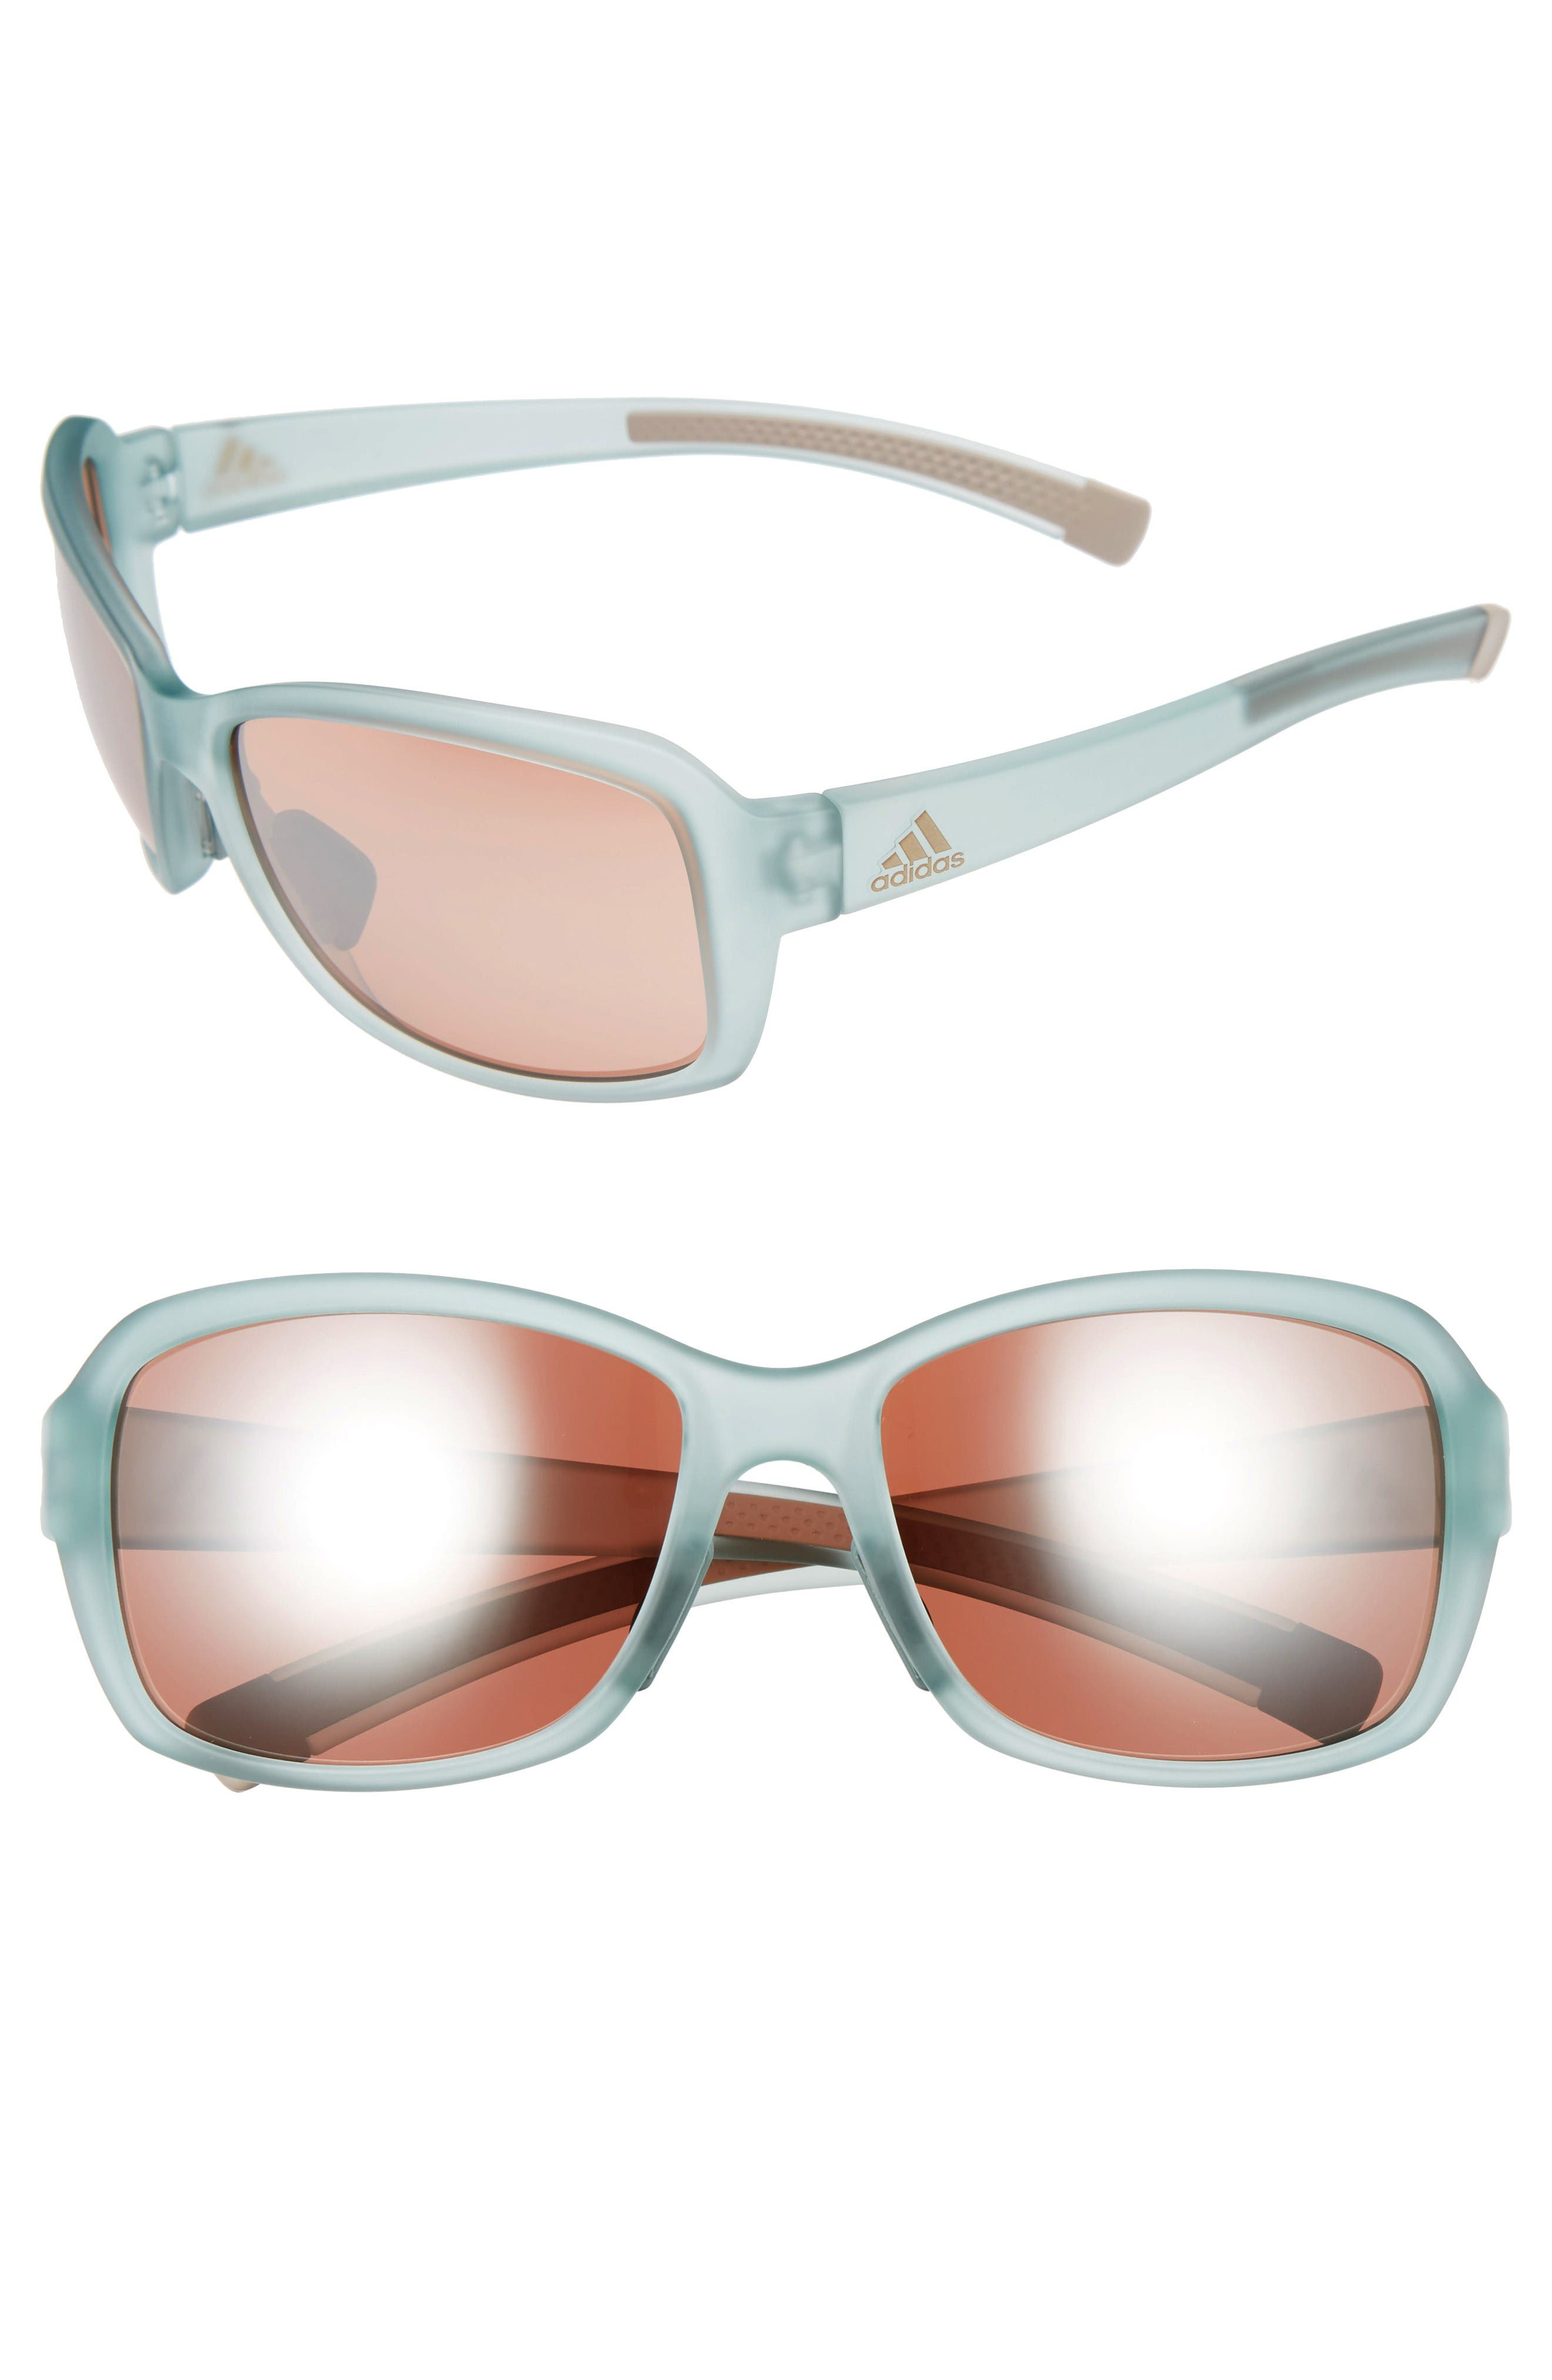 Alternate Image 1 Selected - adidas Baboa 58mm Sunglasses